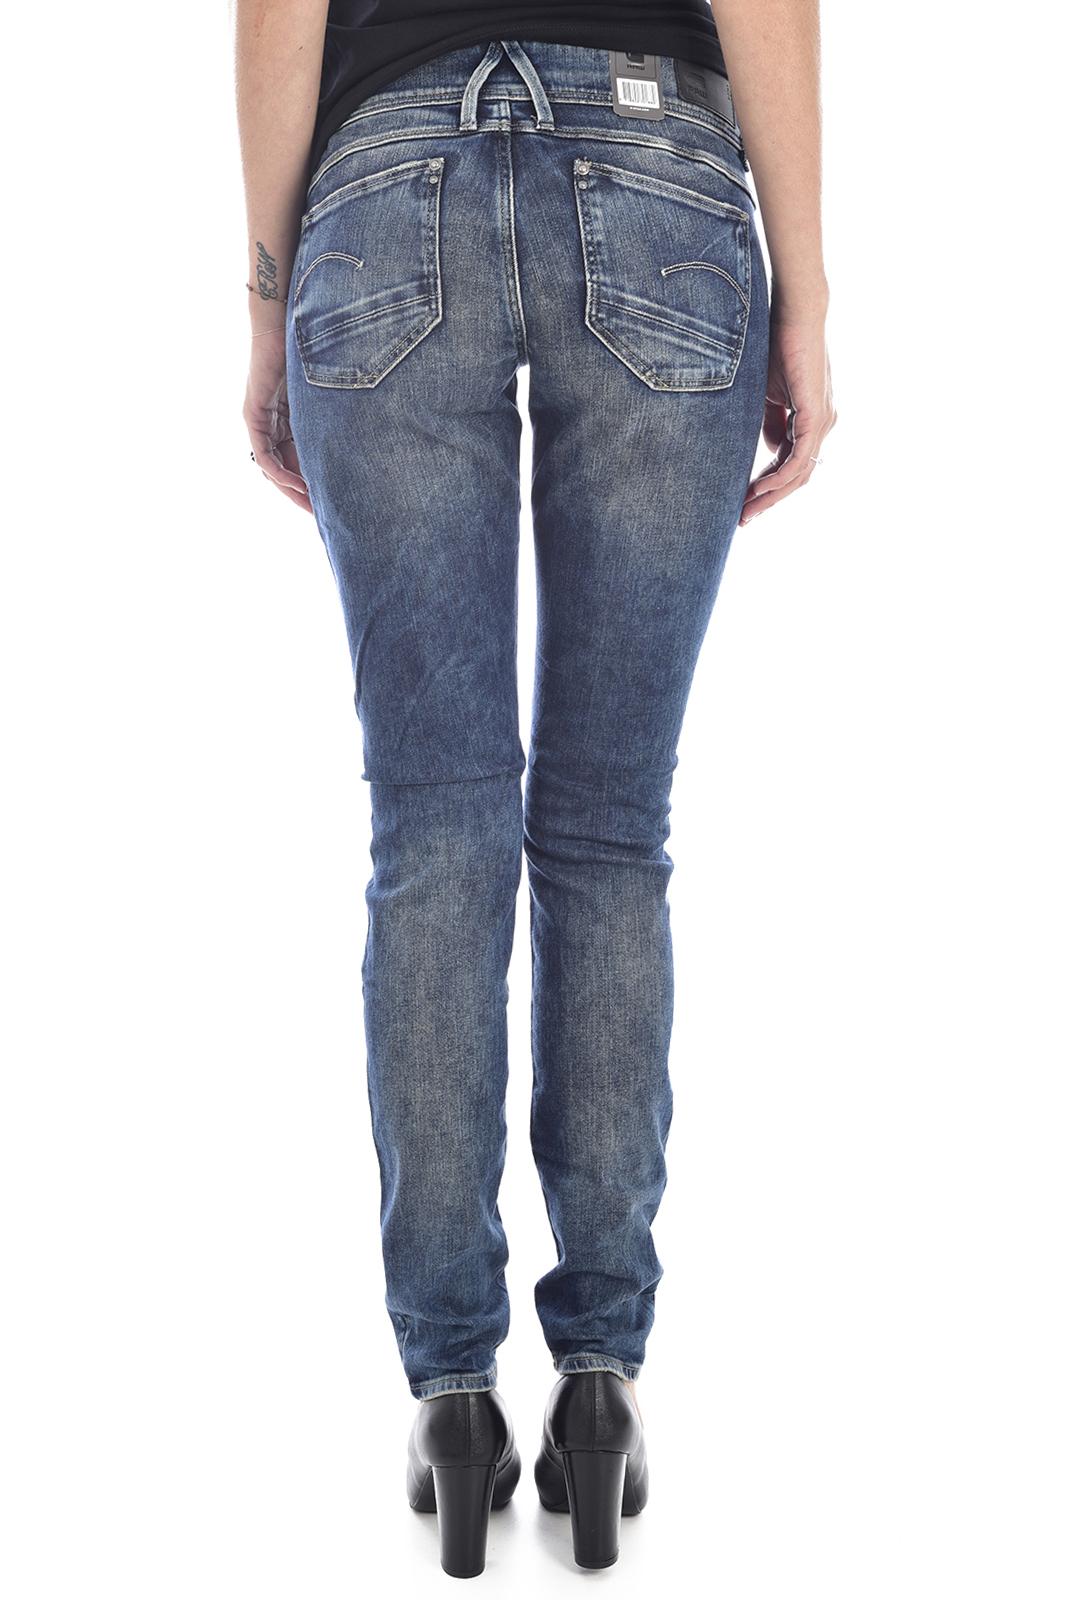 Jeans   G-star 60885-6128-071 lynn bleu